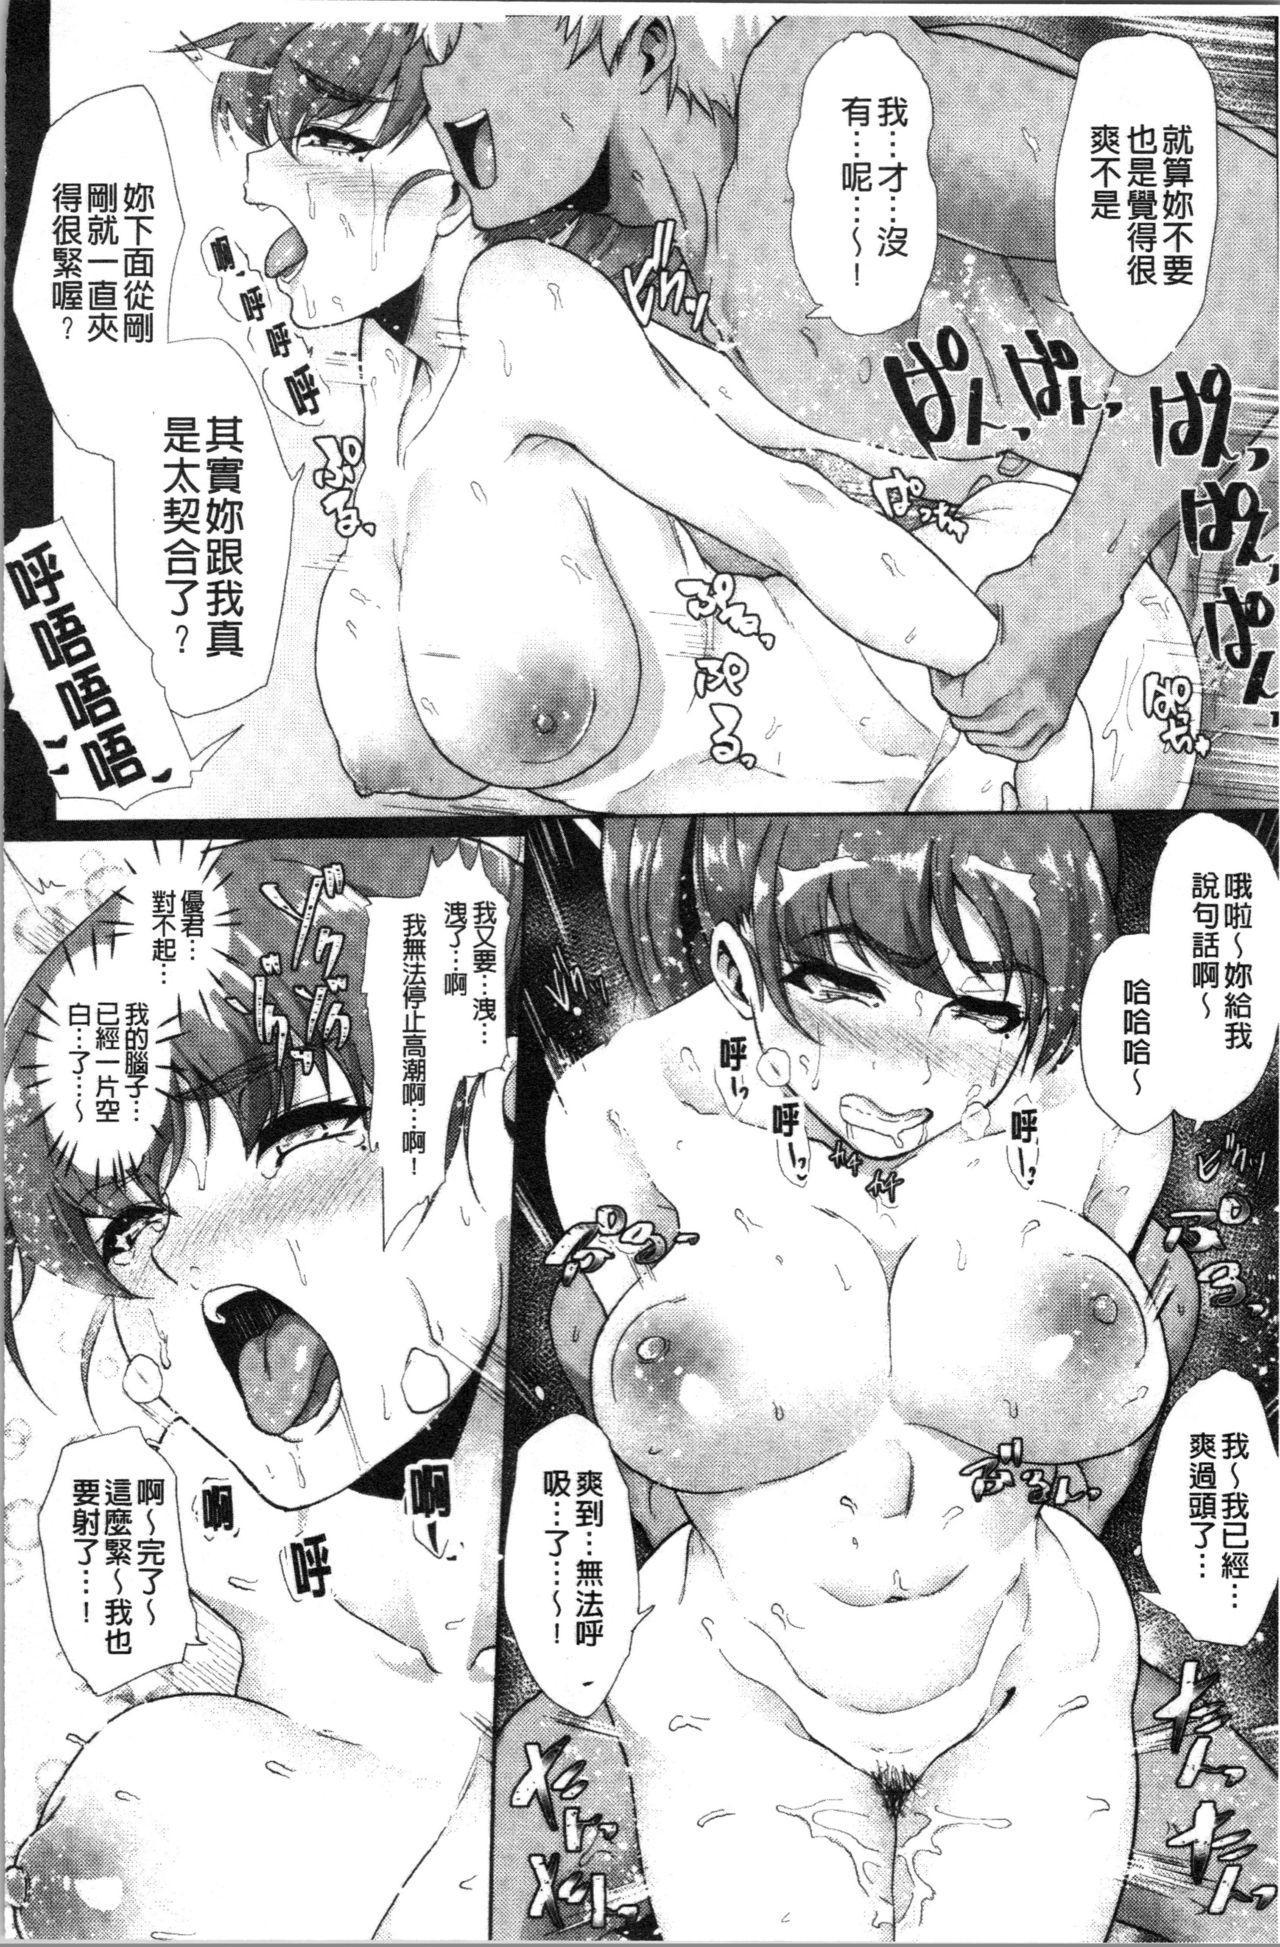 Kanojo ga SEX ni nare teru wake | 女友對激情性愛變很習慣的理由 78